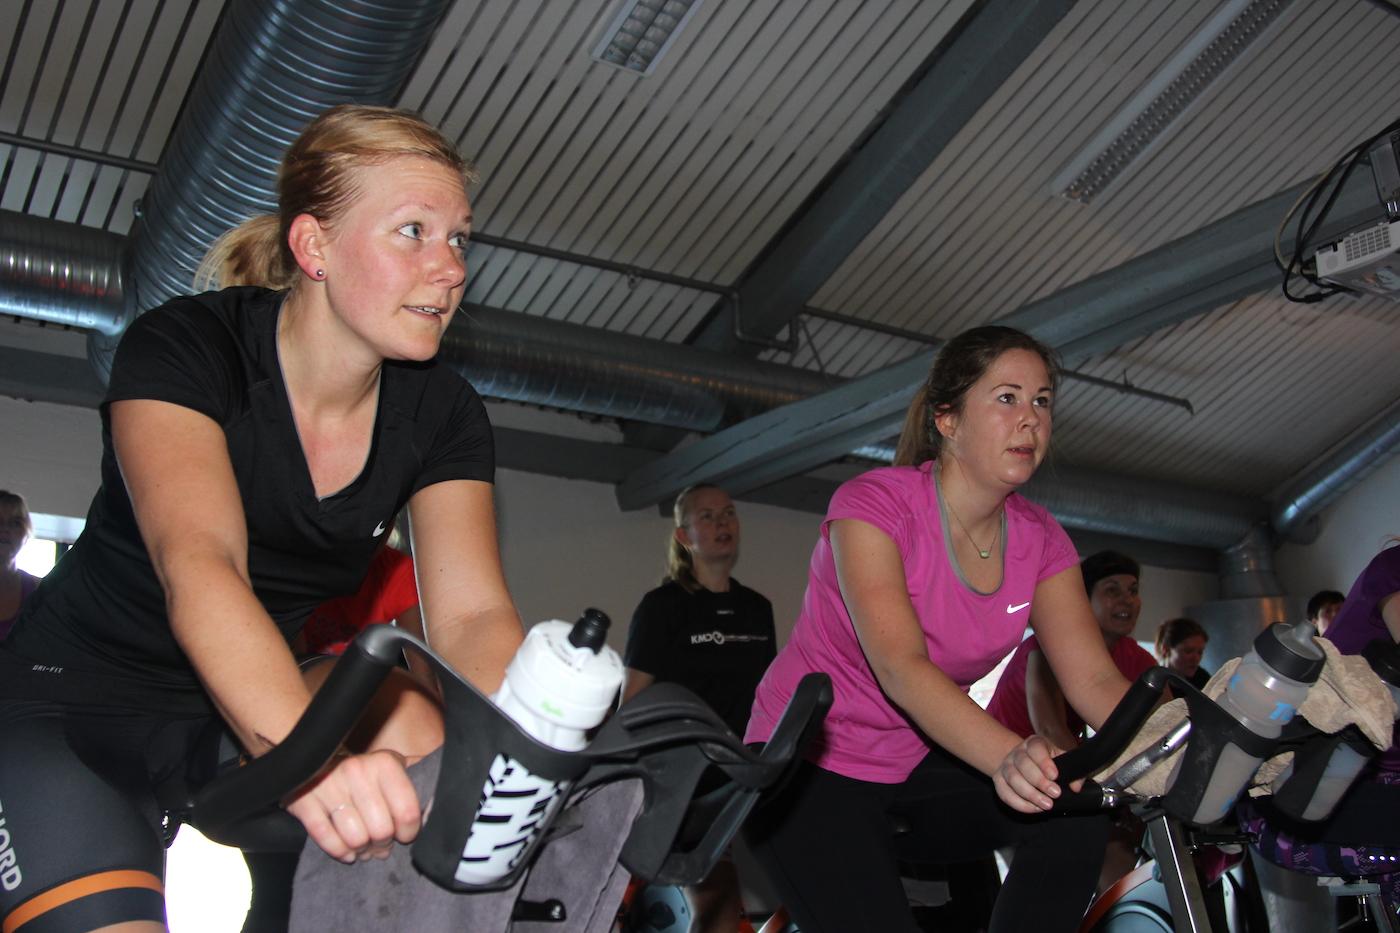 INNSATS: Ladies Edition first workout var fulltegnet i lang tid før helgas samling, og innsatsen var upåklagelig. Foto: Ingeborg Scheve